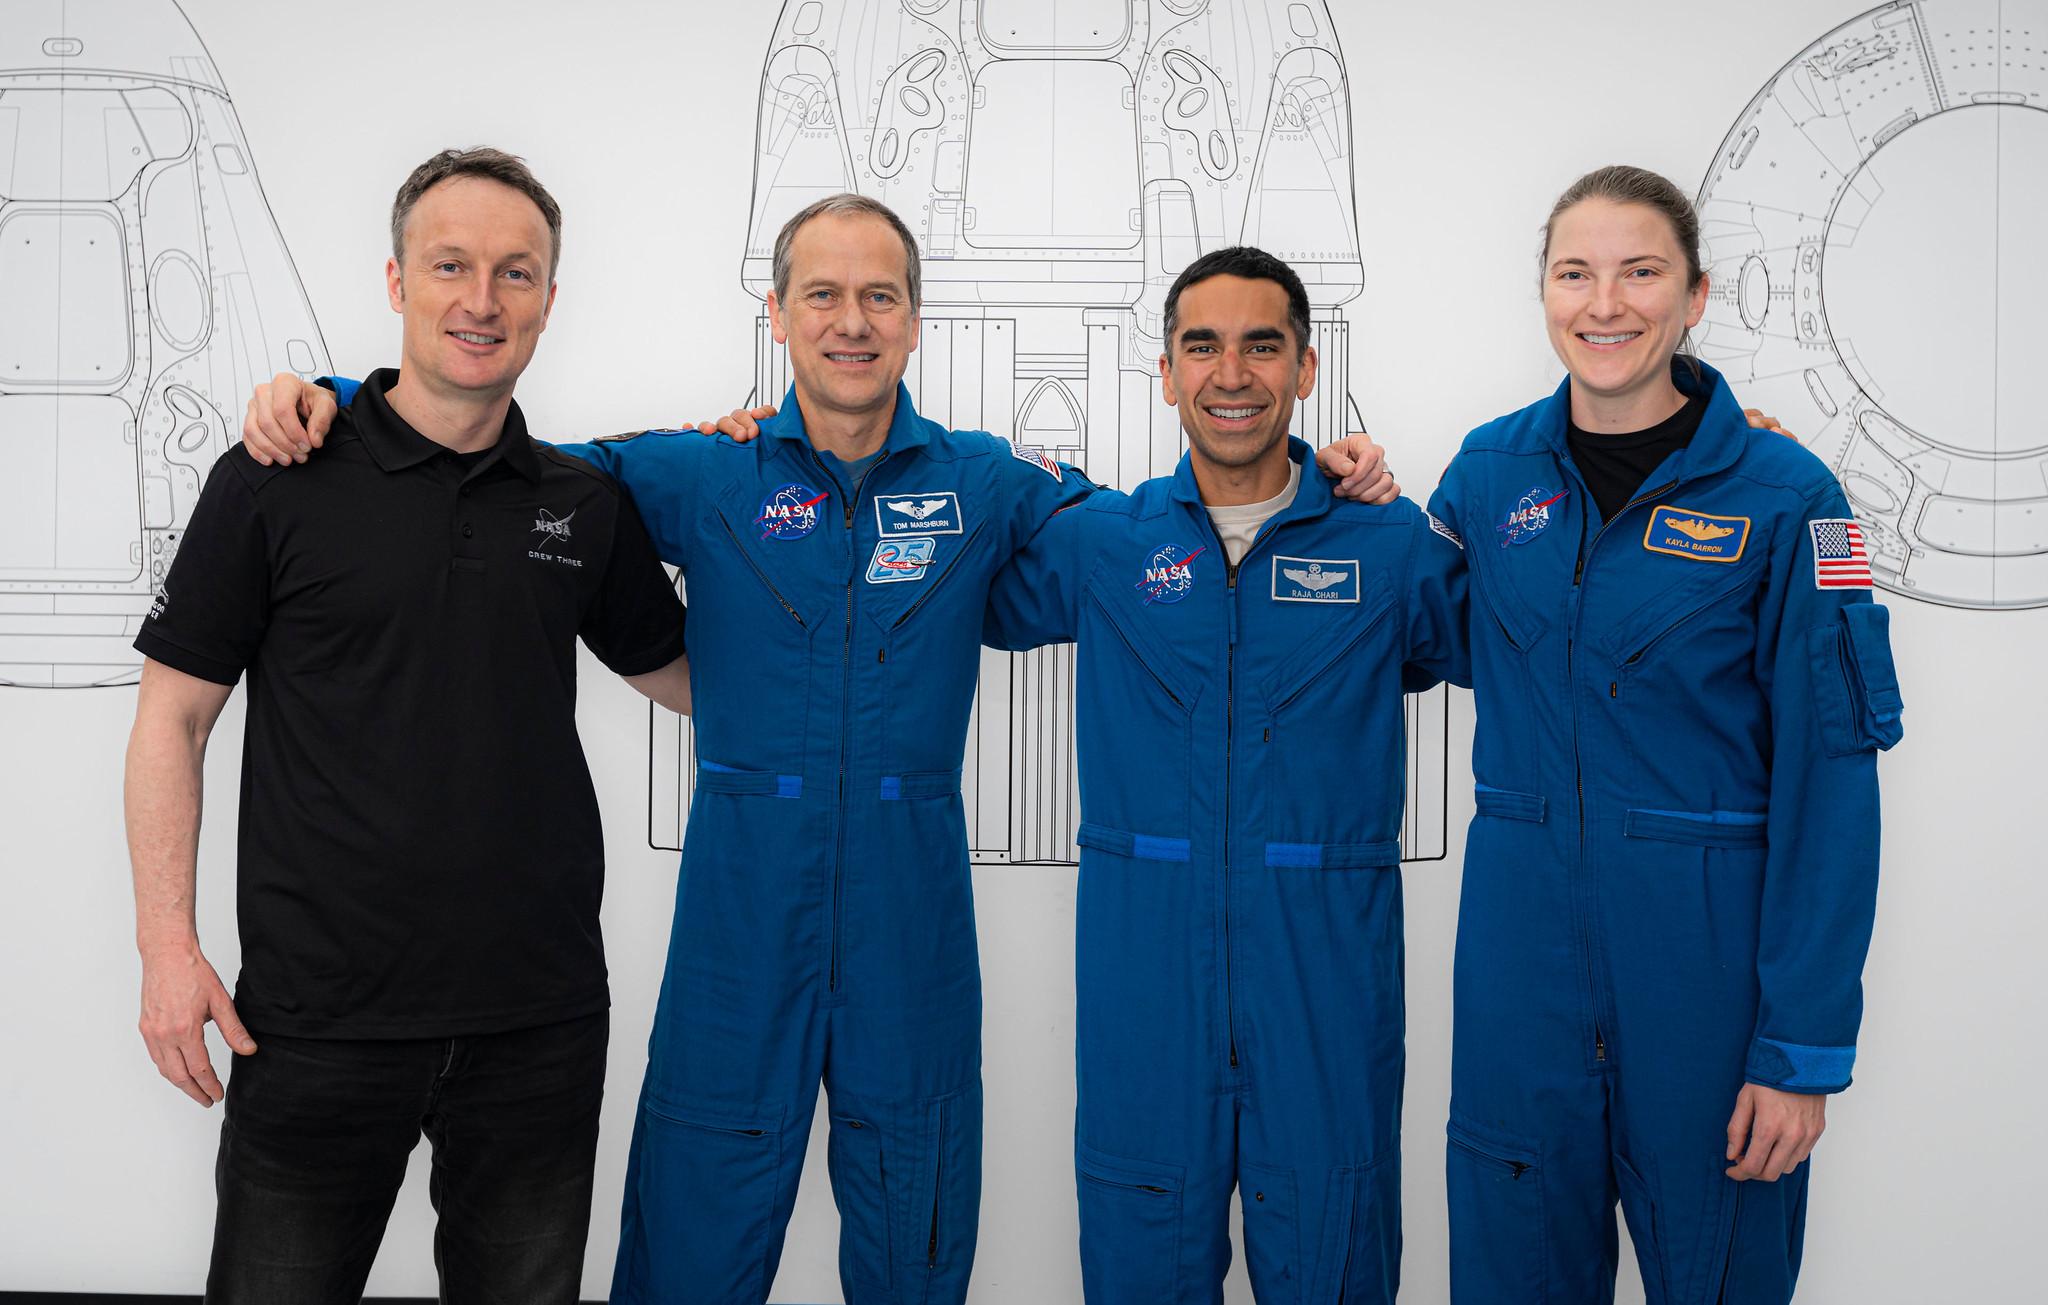 SpaceX Crew-3 astronauts (from left) Matthias Maurer, Thomas Marshburn, Raja Chari and Kayla Barron pose for a portrait during preflight training.